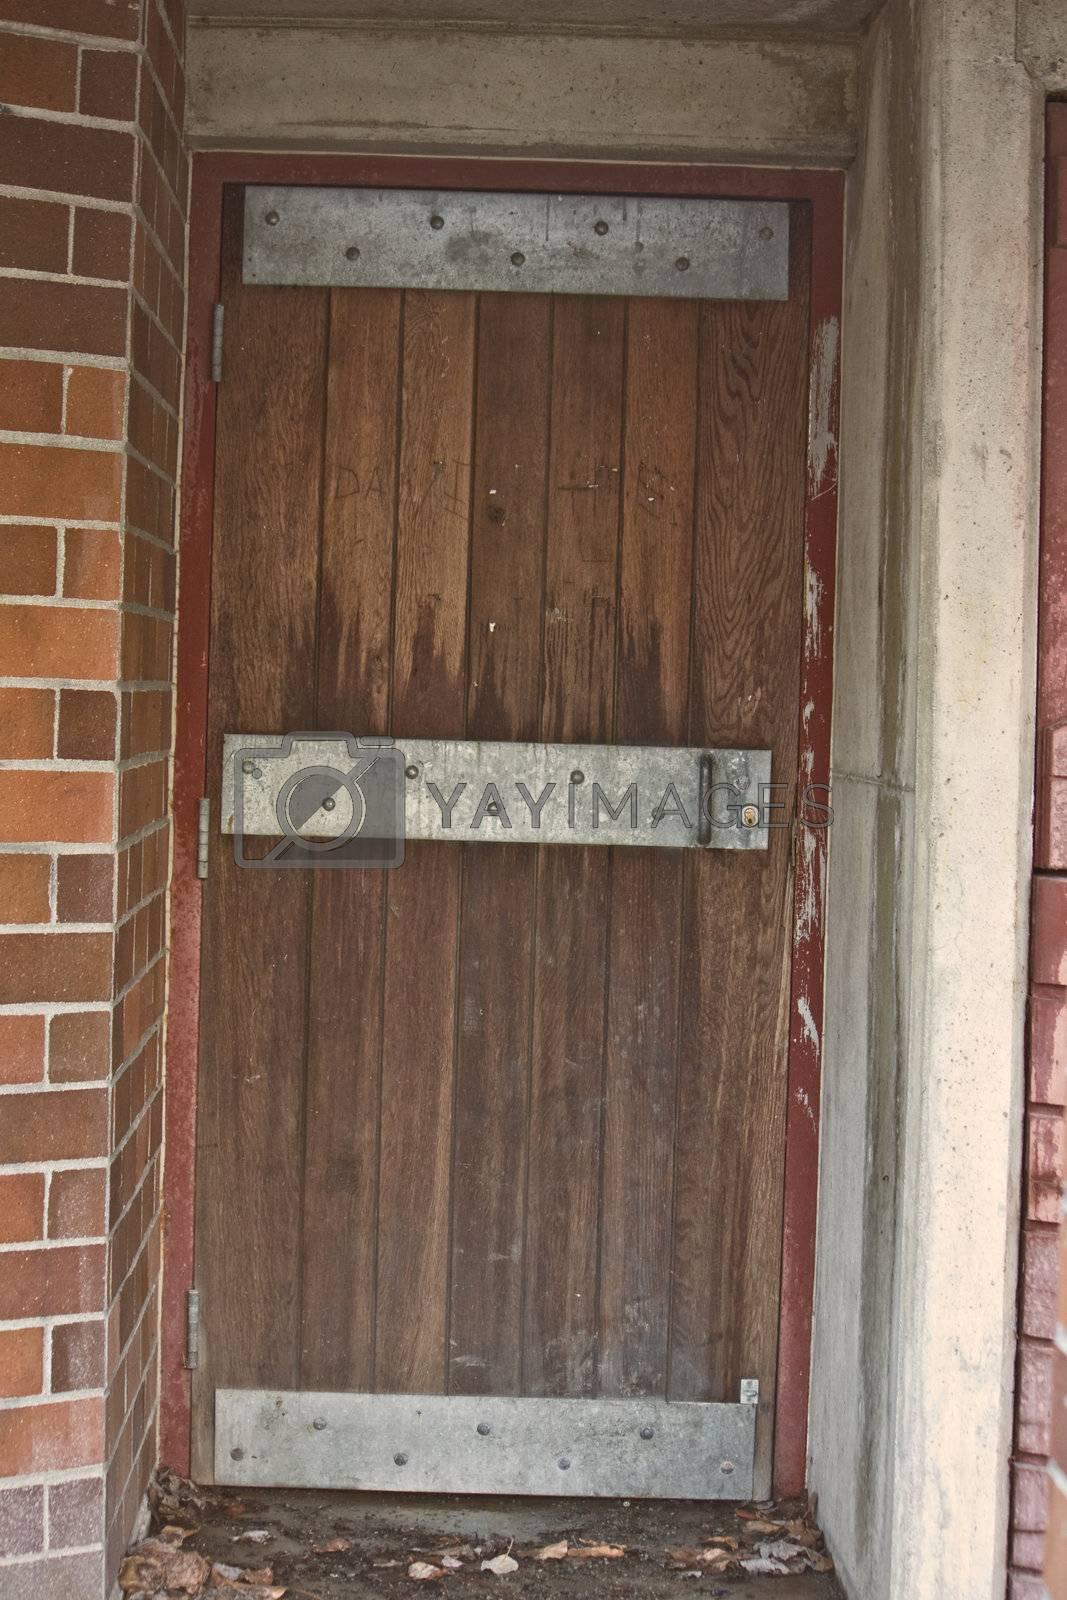 Old Looking Steel Reinforced Door with Wood Boards